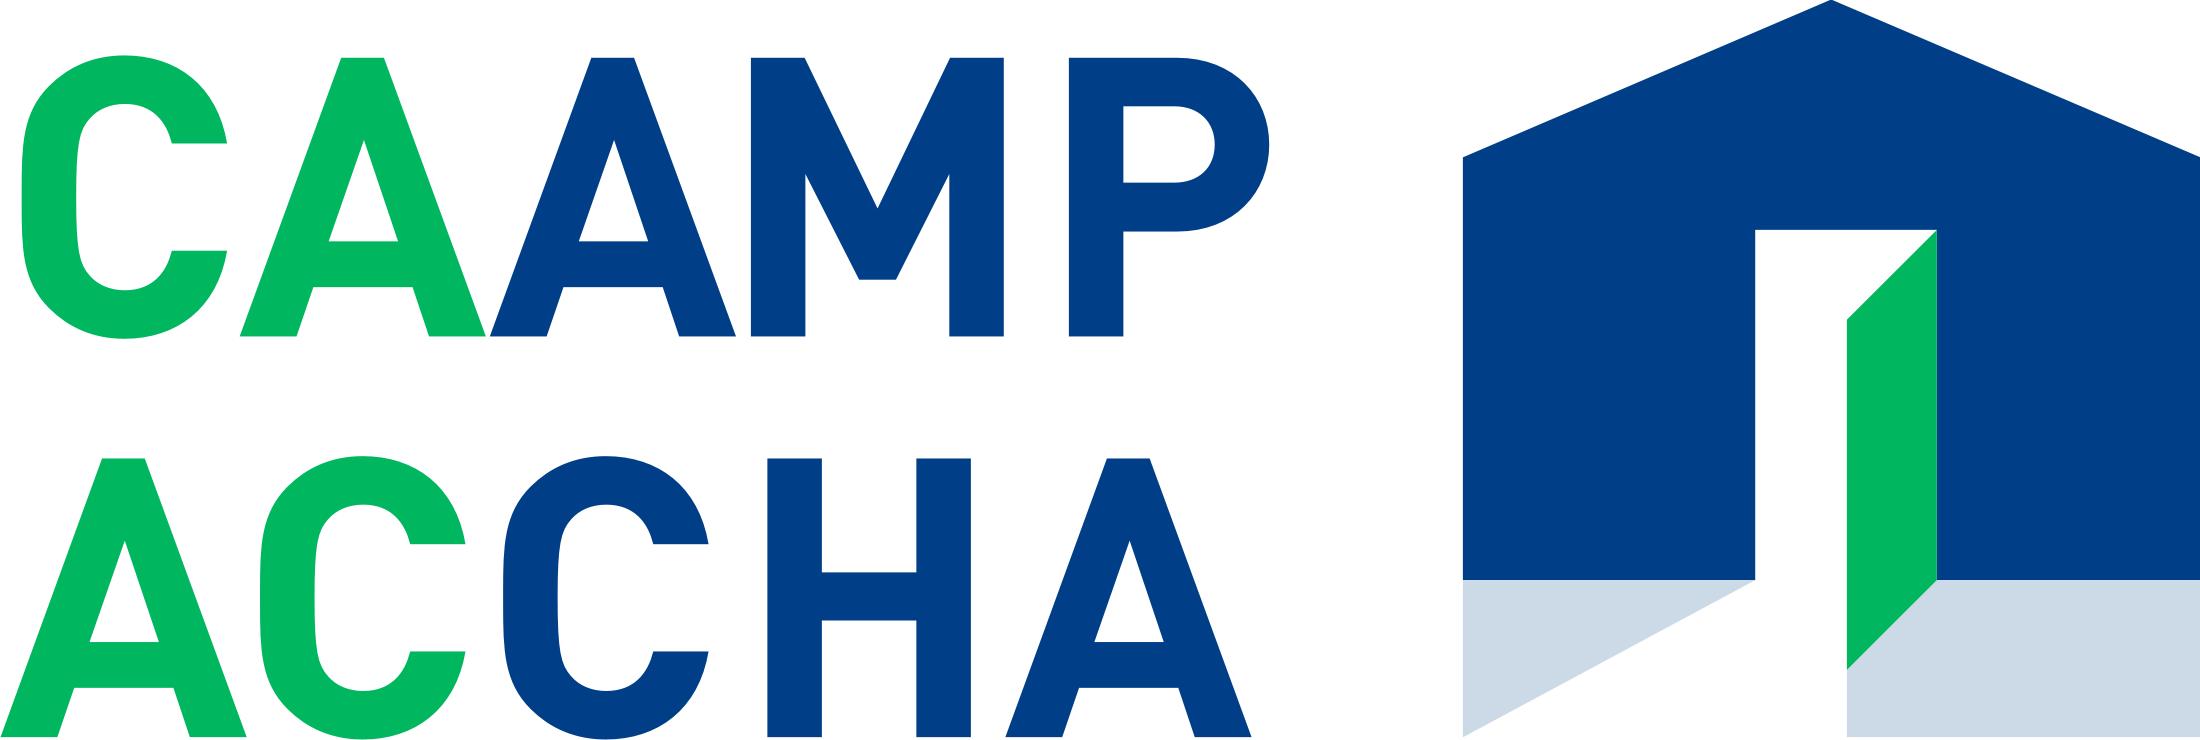 caamp-1